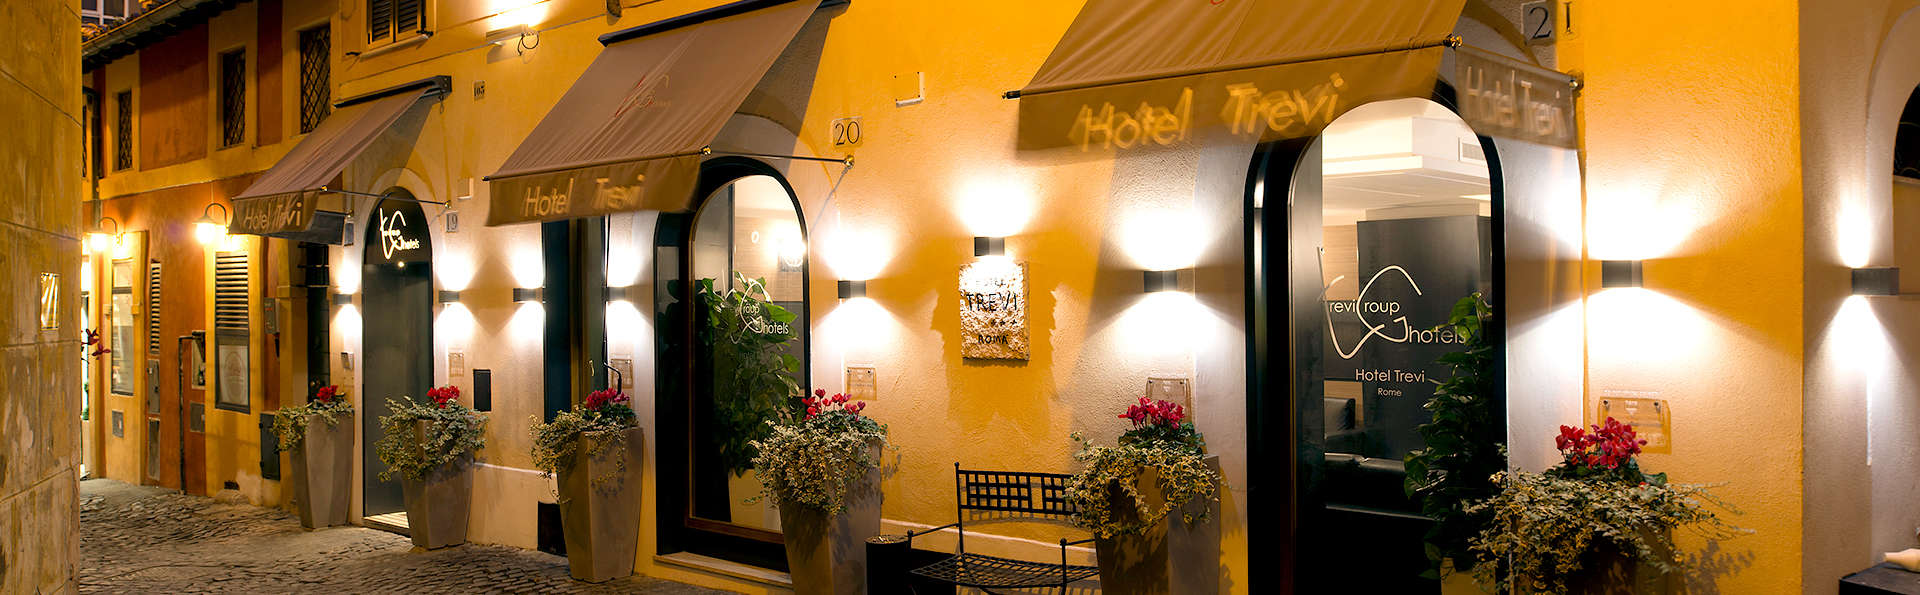 Hotel Trevi - Edit_Front3.jpg